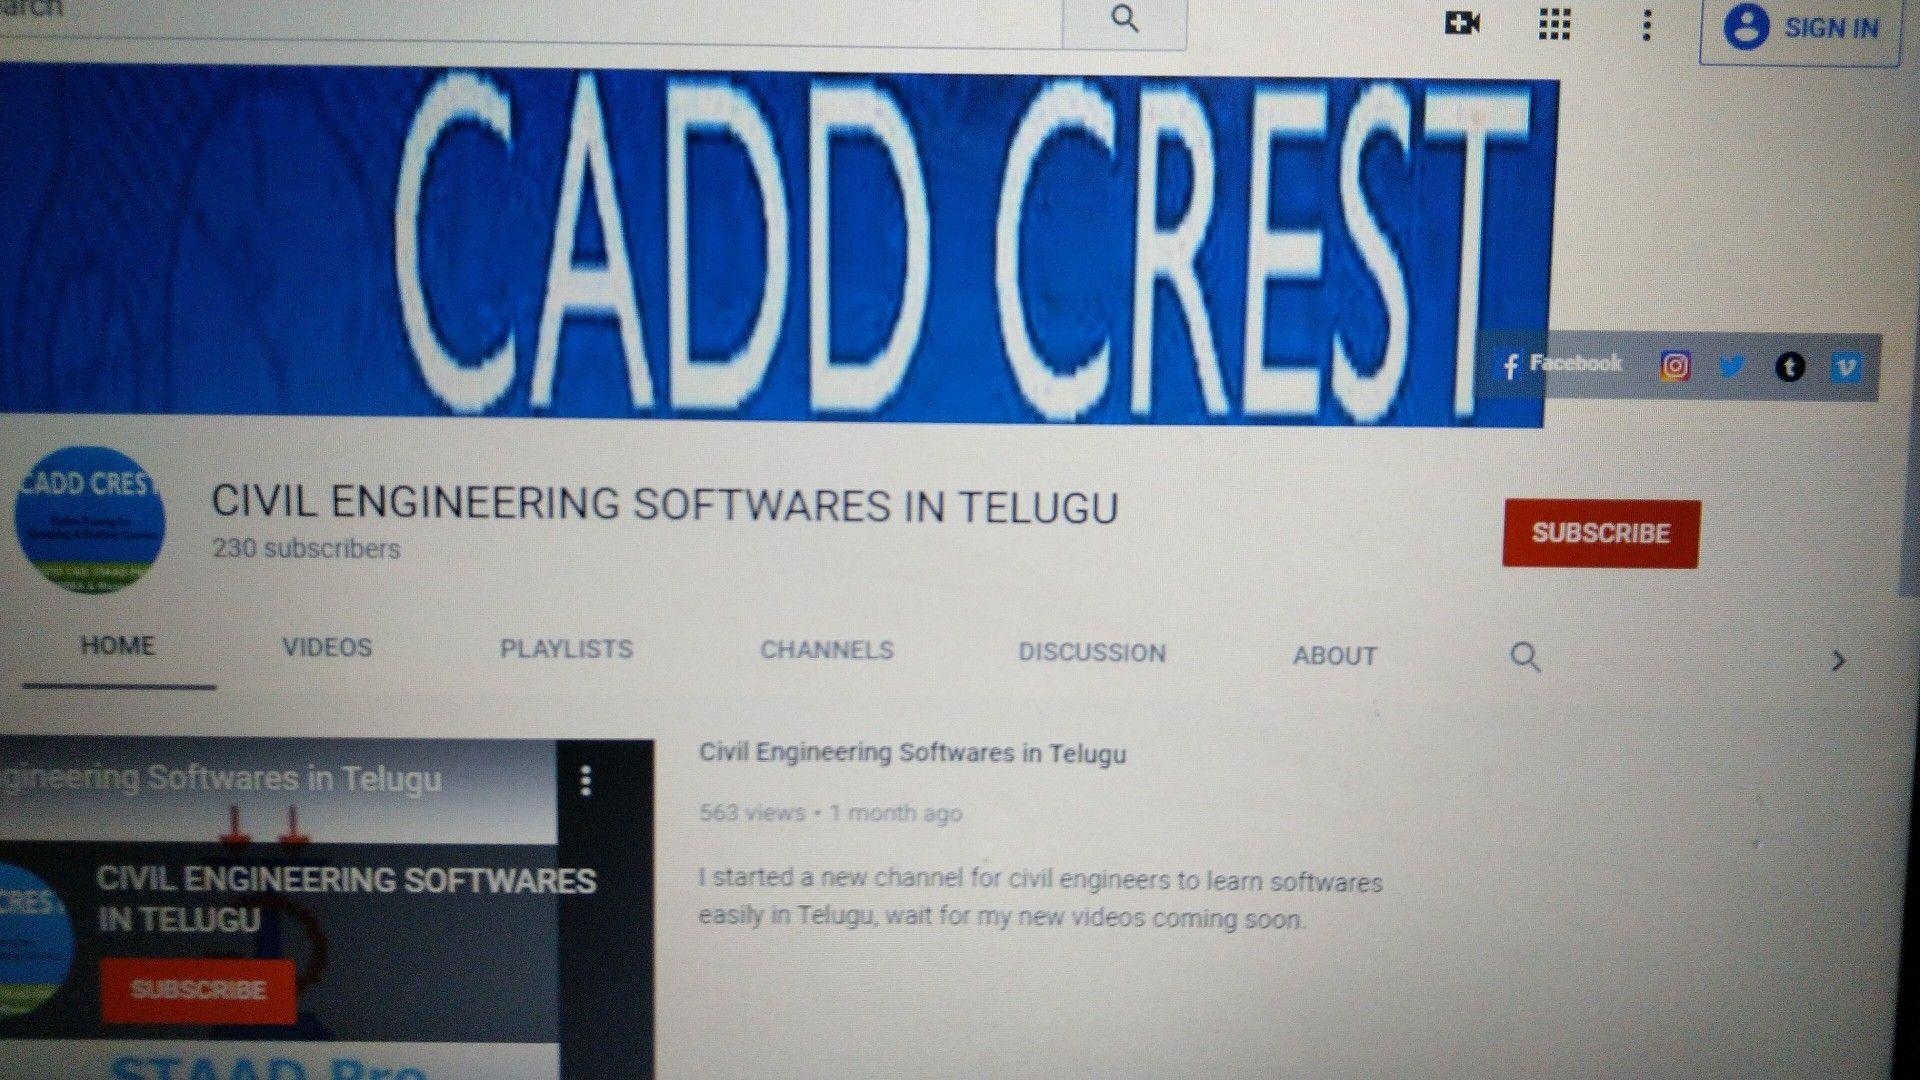 Caddcrest In 2020 Civil Engineering Software Civil Engineering Engineering